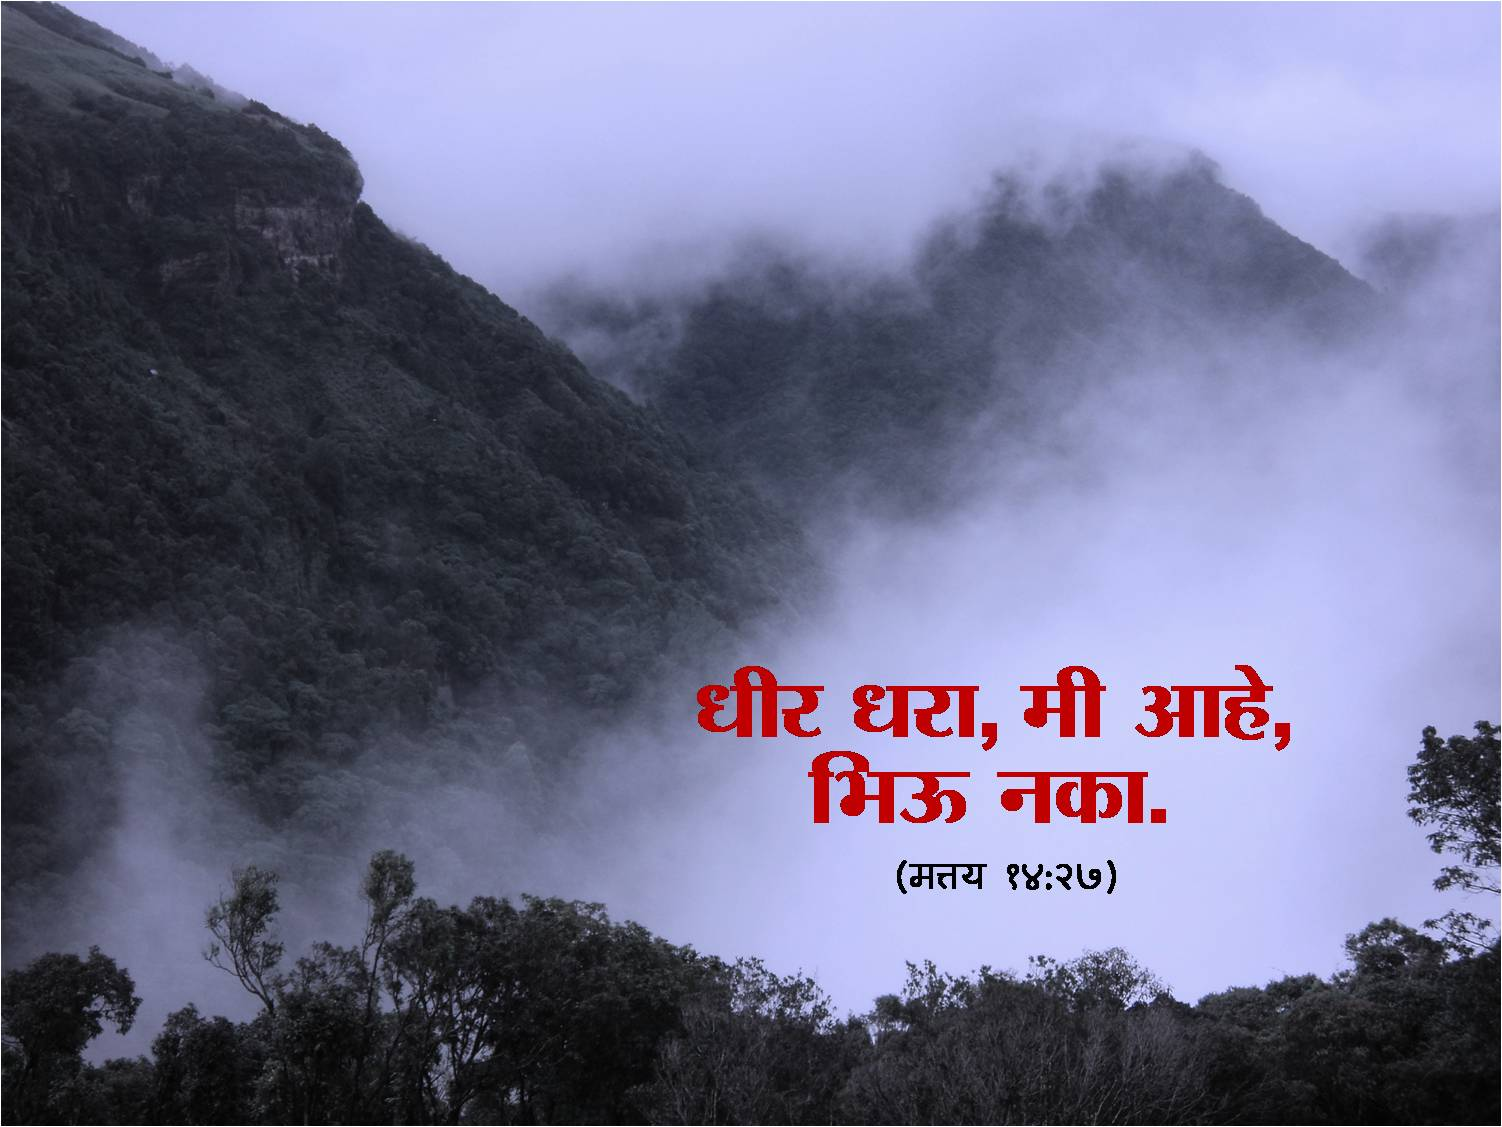 marathi bible wallpaper for - photo #8